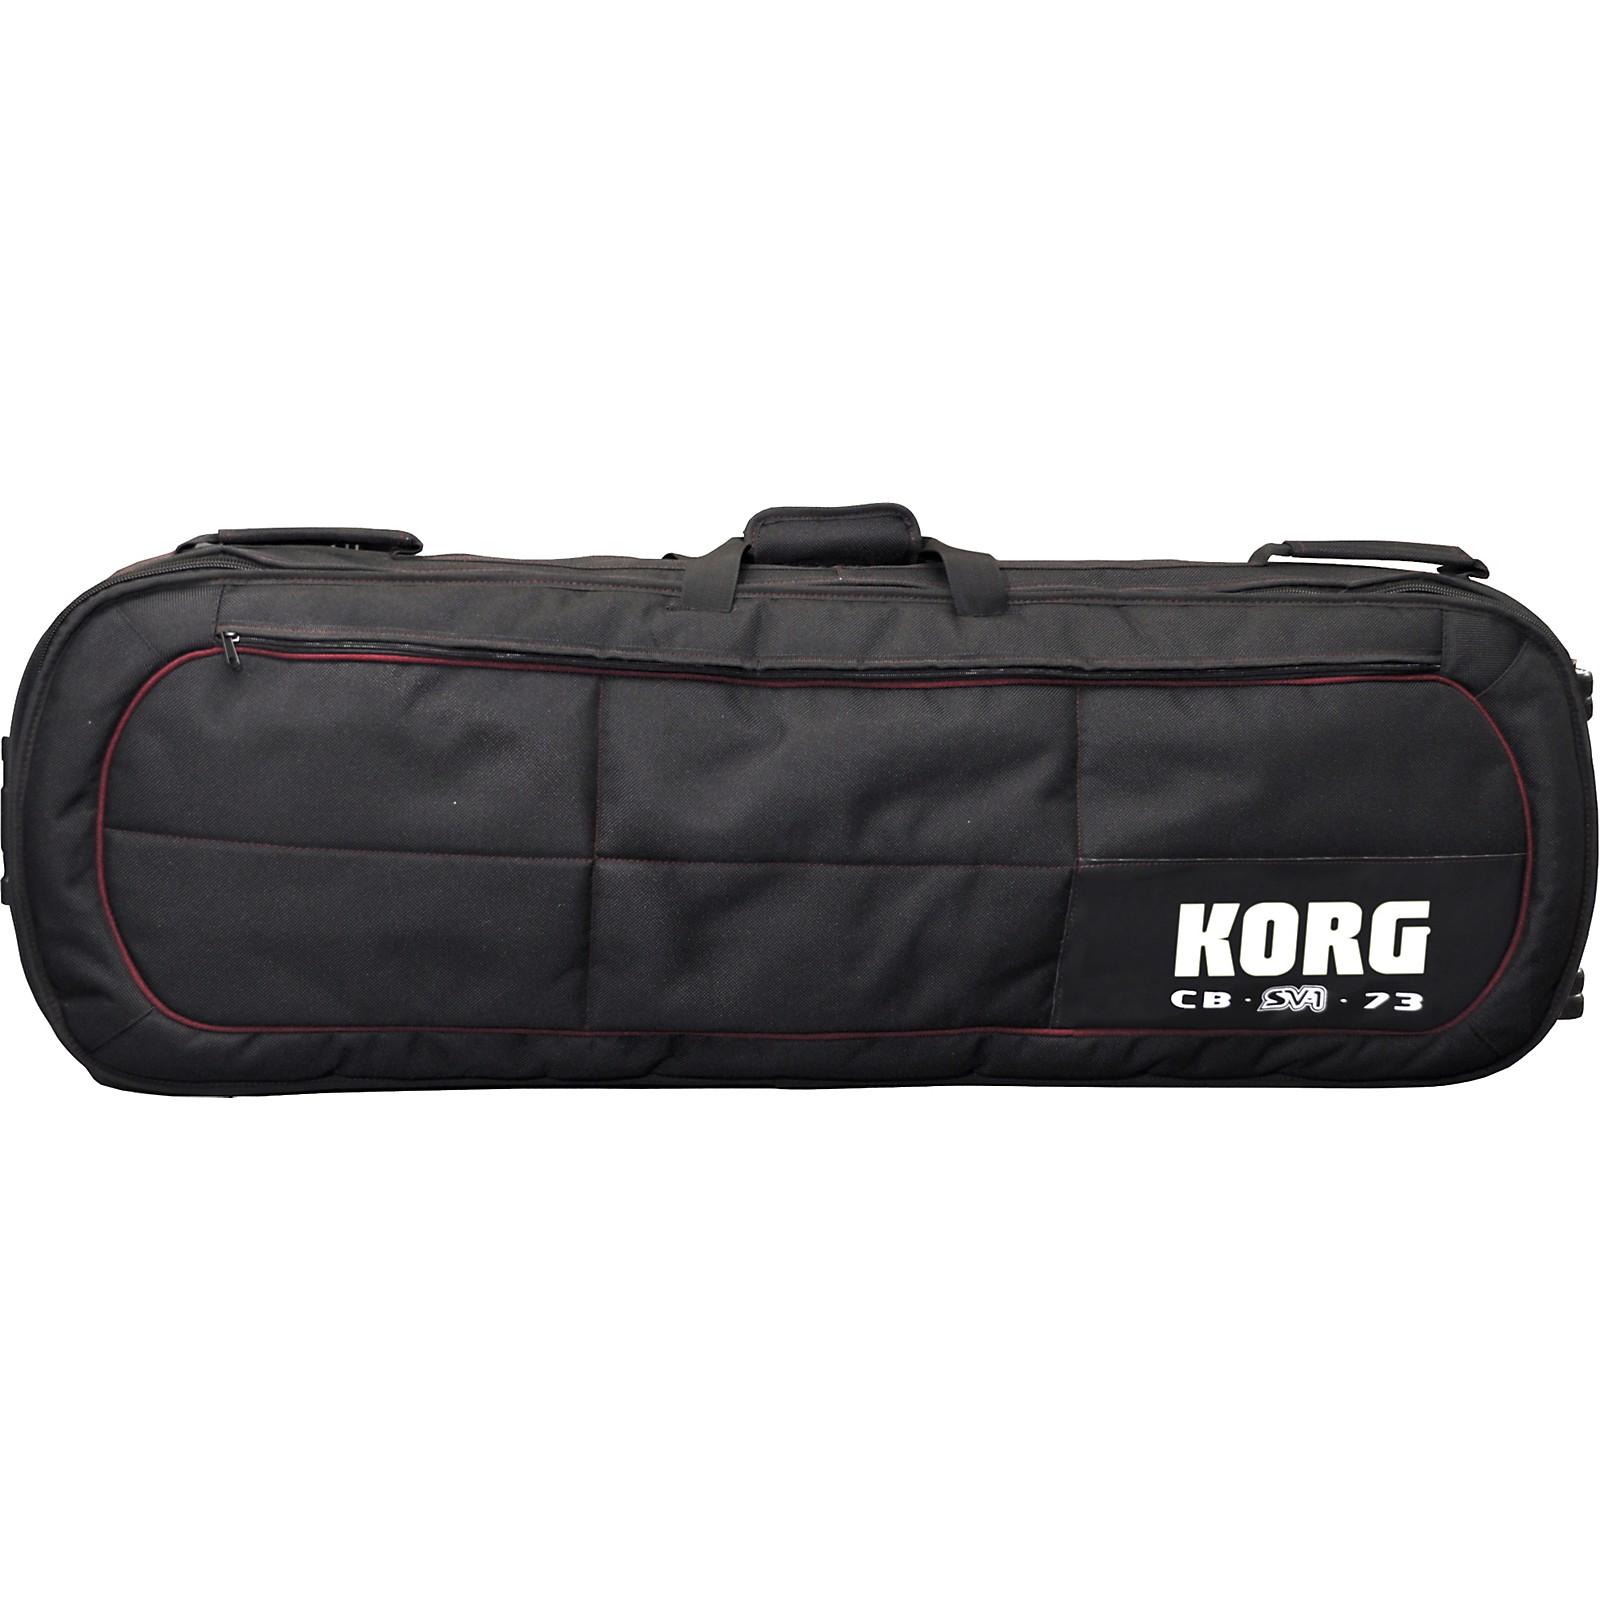 Korg Carrying/Rolling Bag for SV-173